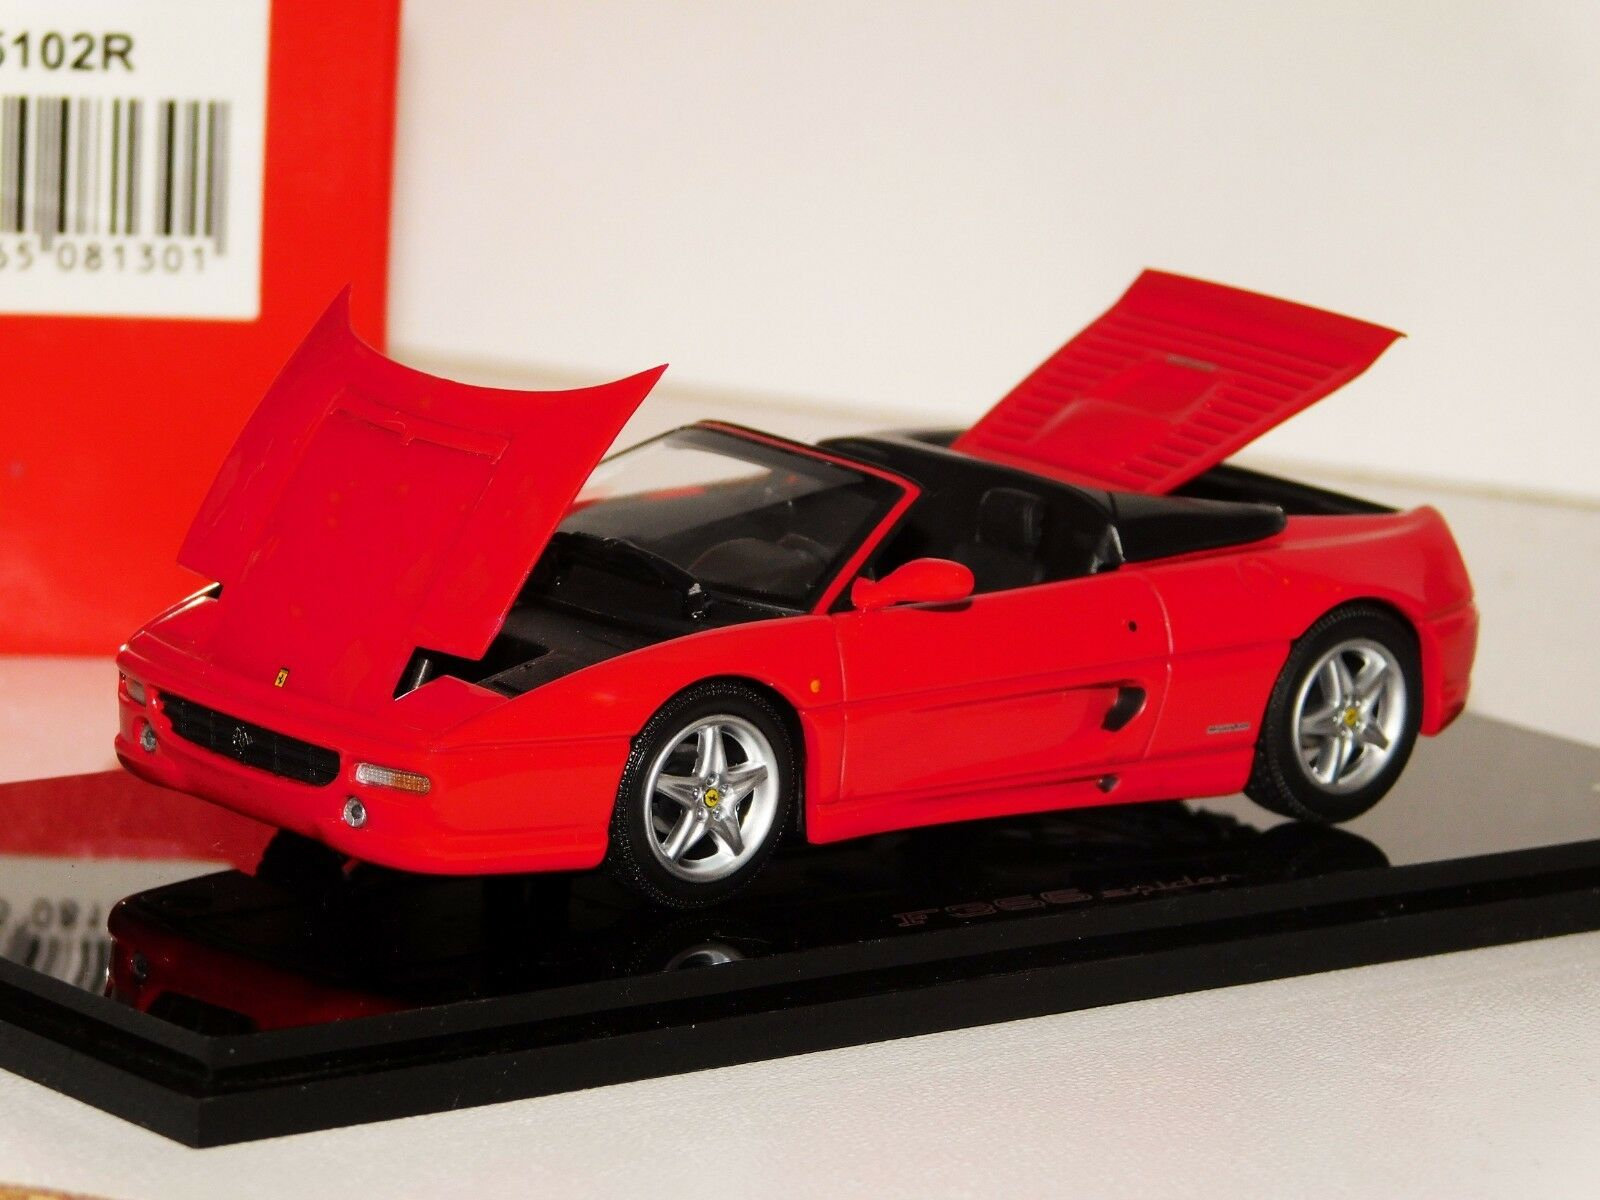 wholesape barato Ferrari F355 Spider Rojo apertura Kyosho 05102R 1 1 1 43  moda